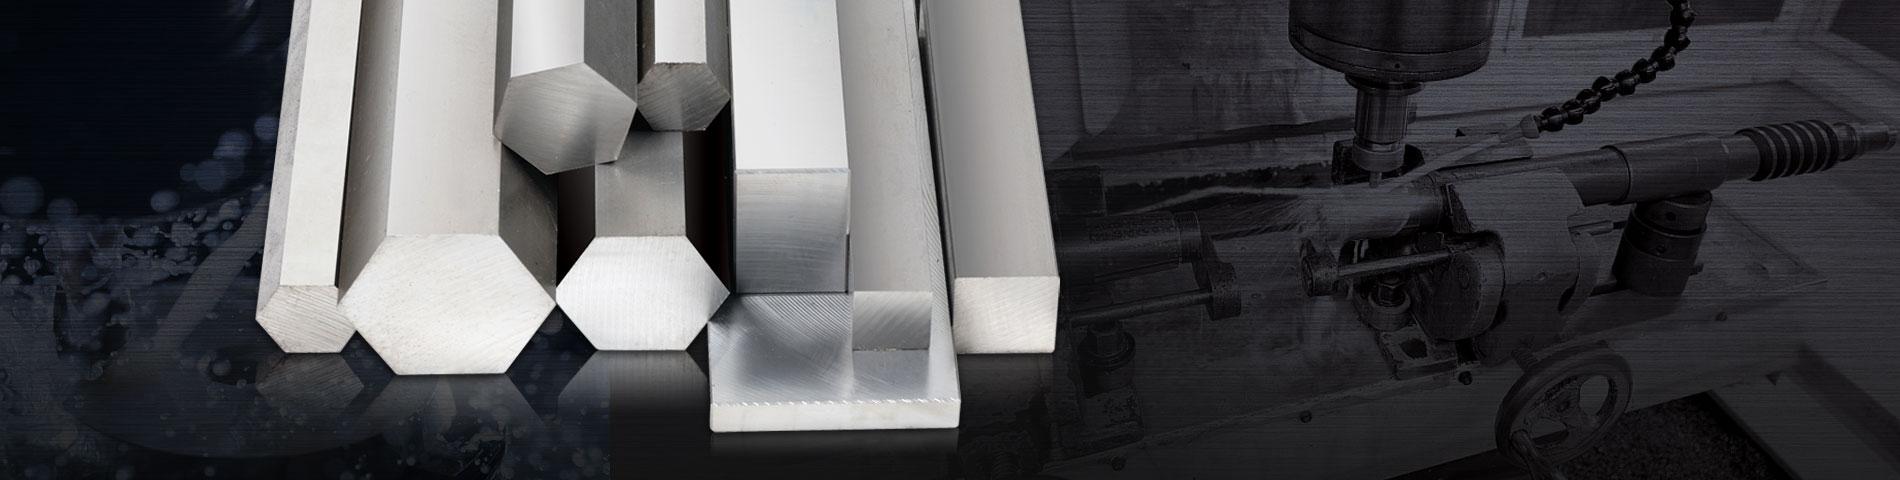 Steel Supplier & Business Integration